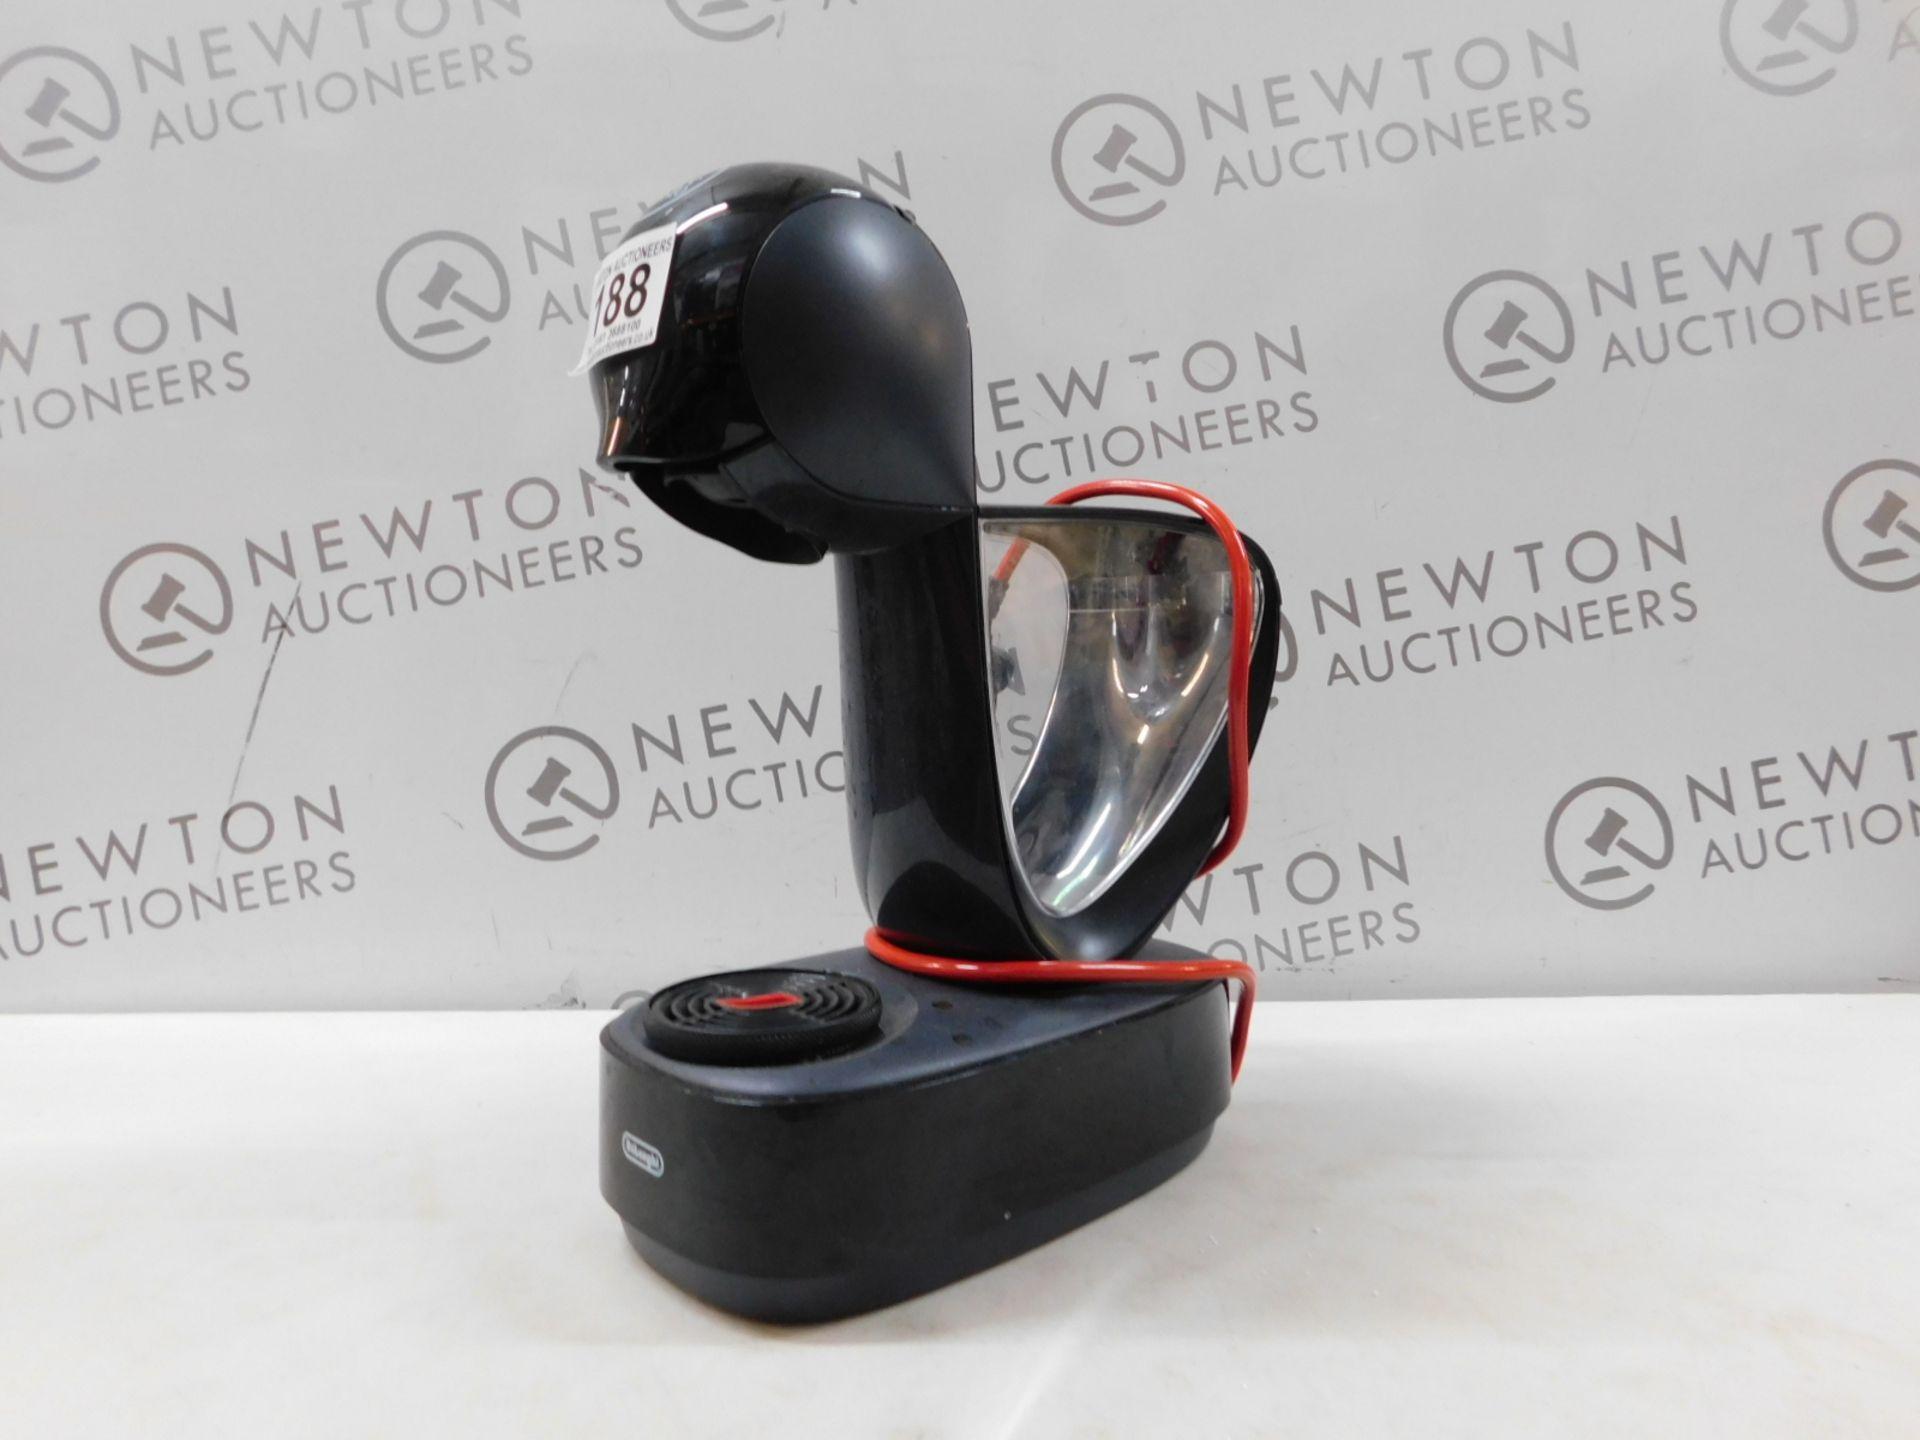 1 NESCAFE DOLCE GUSTO INFINISSIMA AUTOMATIC COFFEE POD MACHINE RRP £114.99